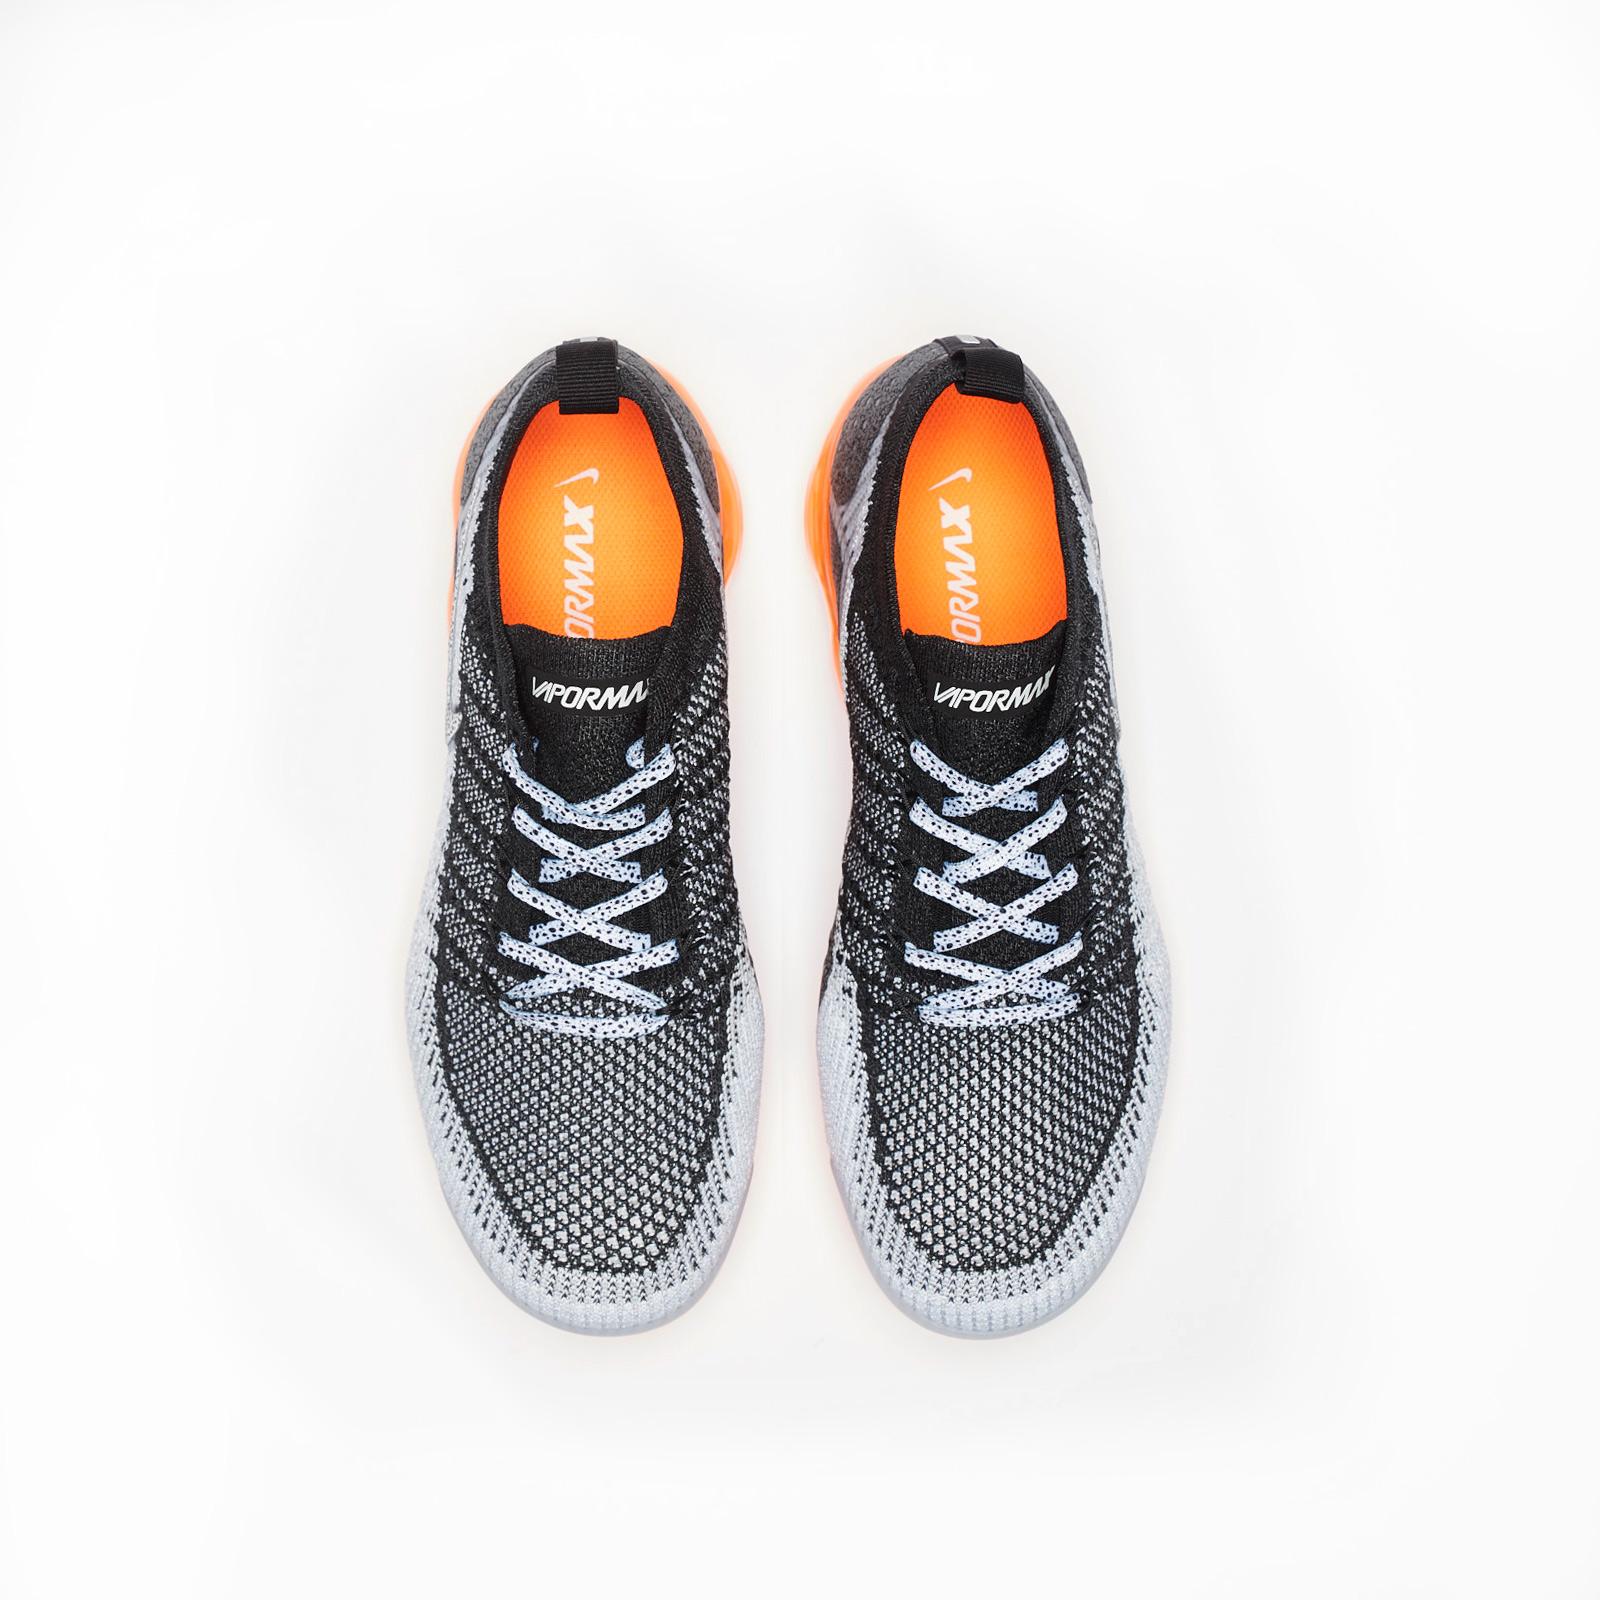 Nike Air VaporMax 2.0 Safari Men's WhiteWhite Black Total Orange 942842 106